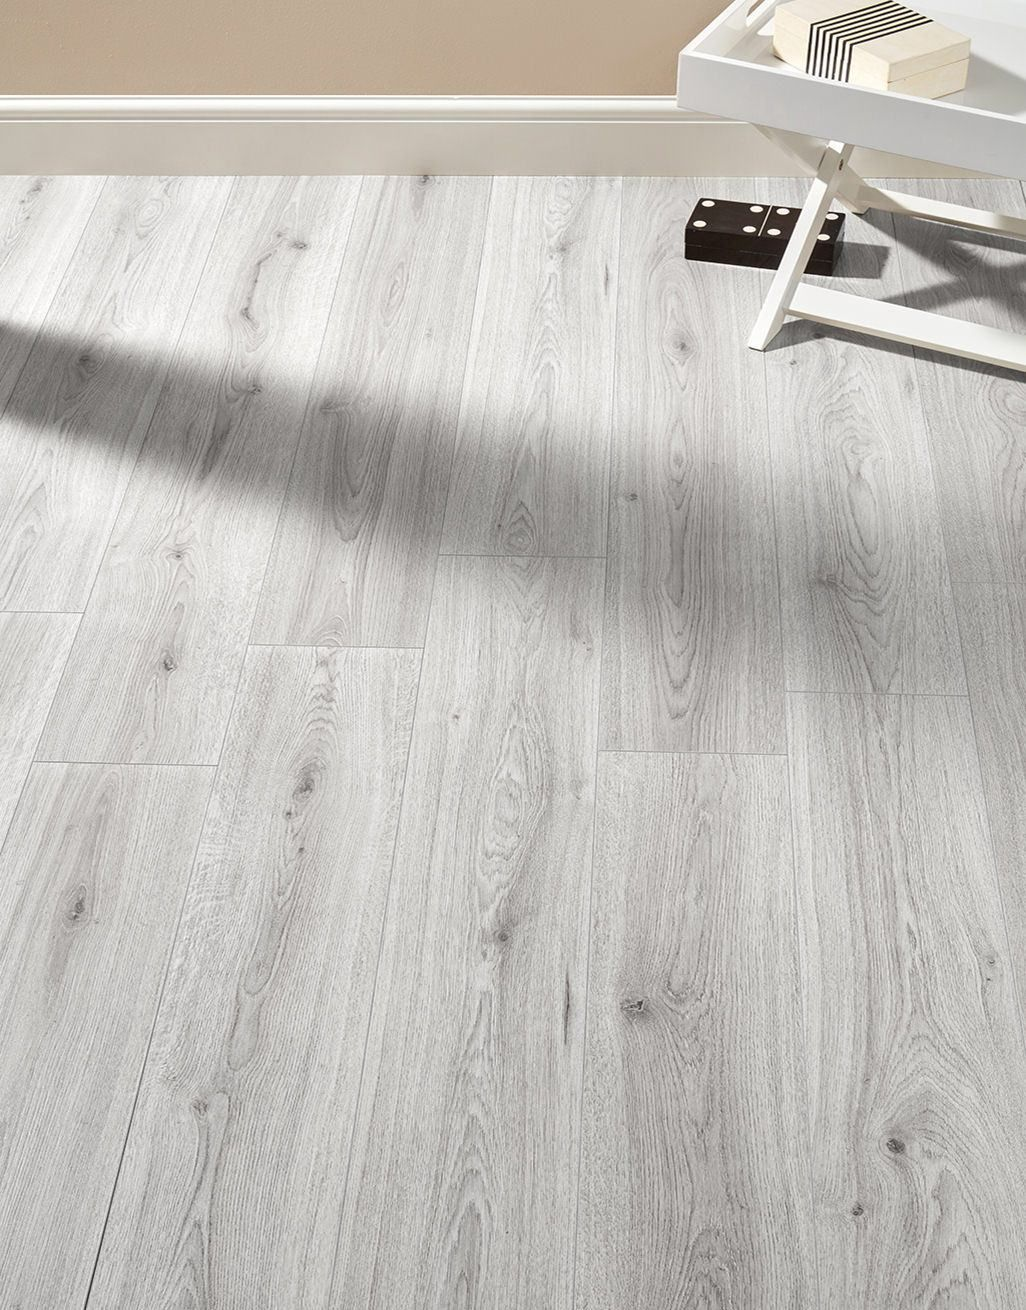 Farmhouse - Light Grey Oak Laminate Flooring | Flooring ...